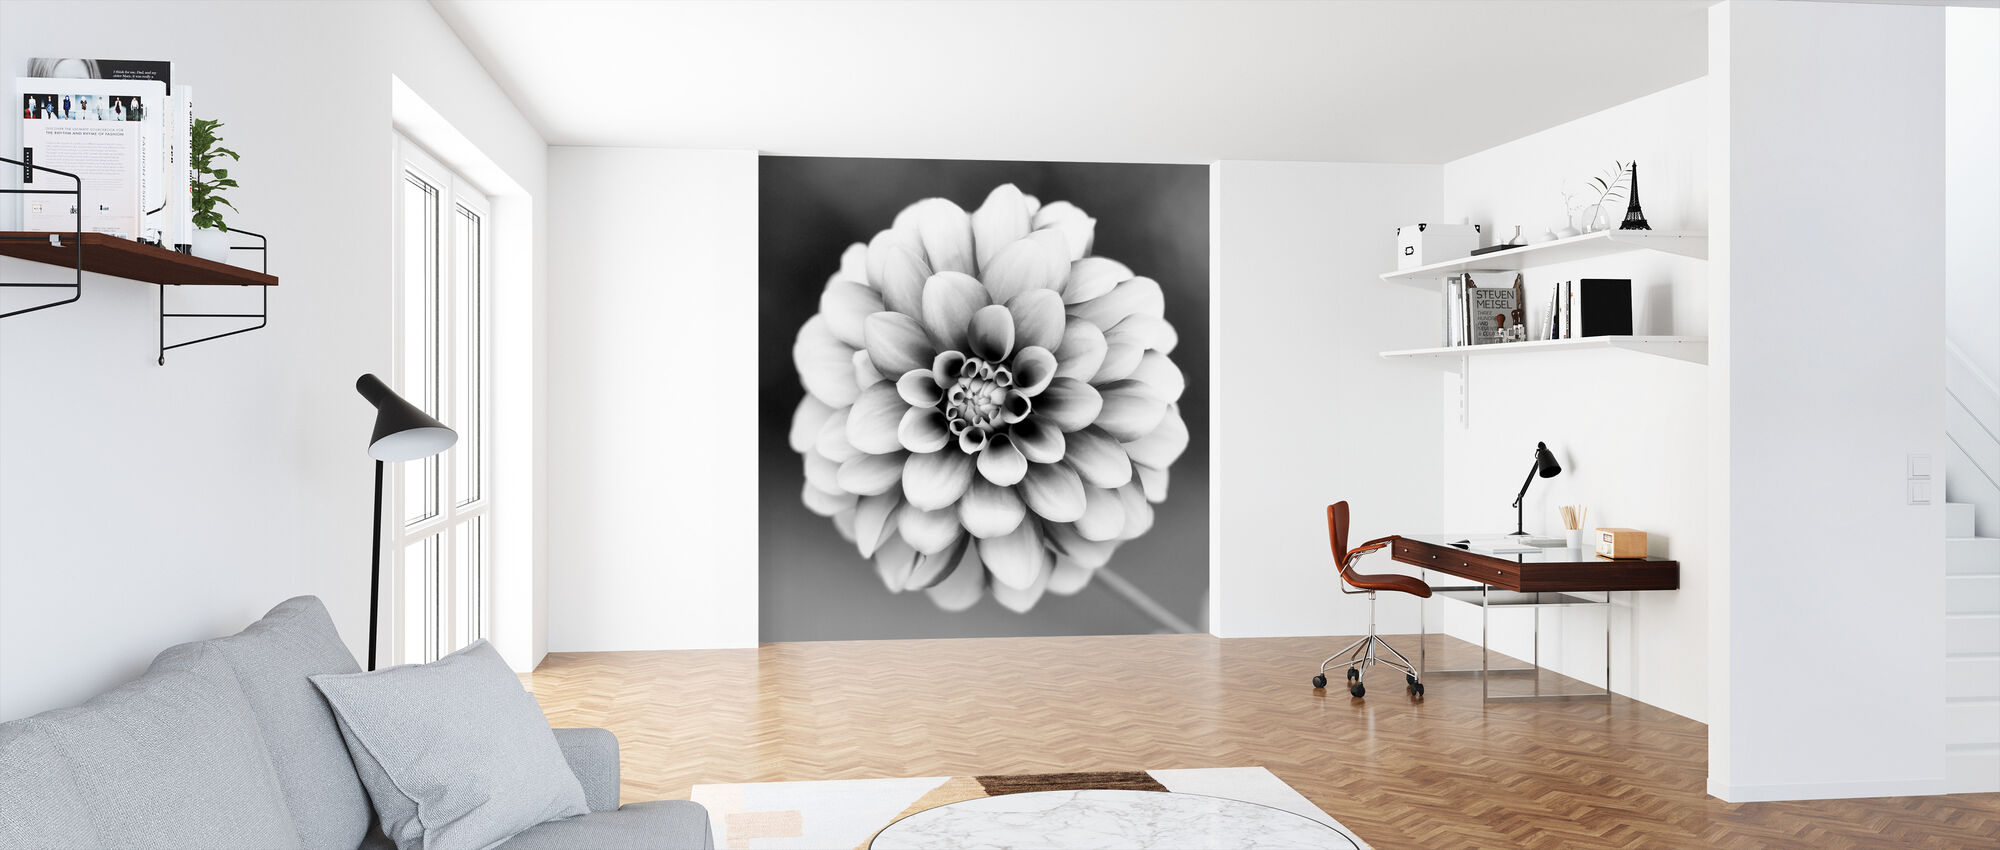 Dahlia - Wallpaper - Office